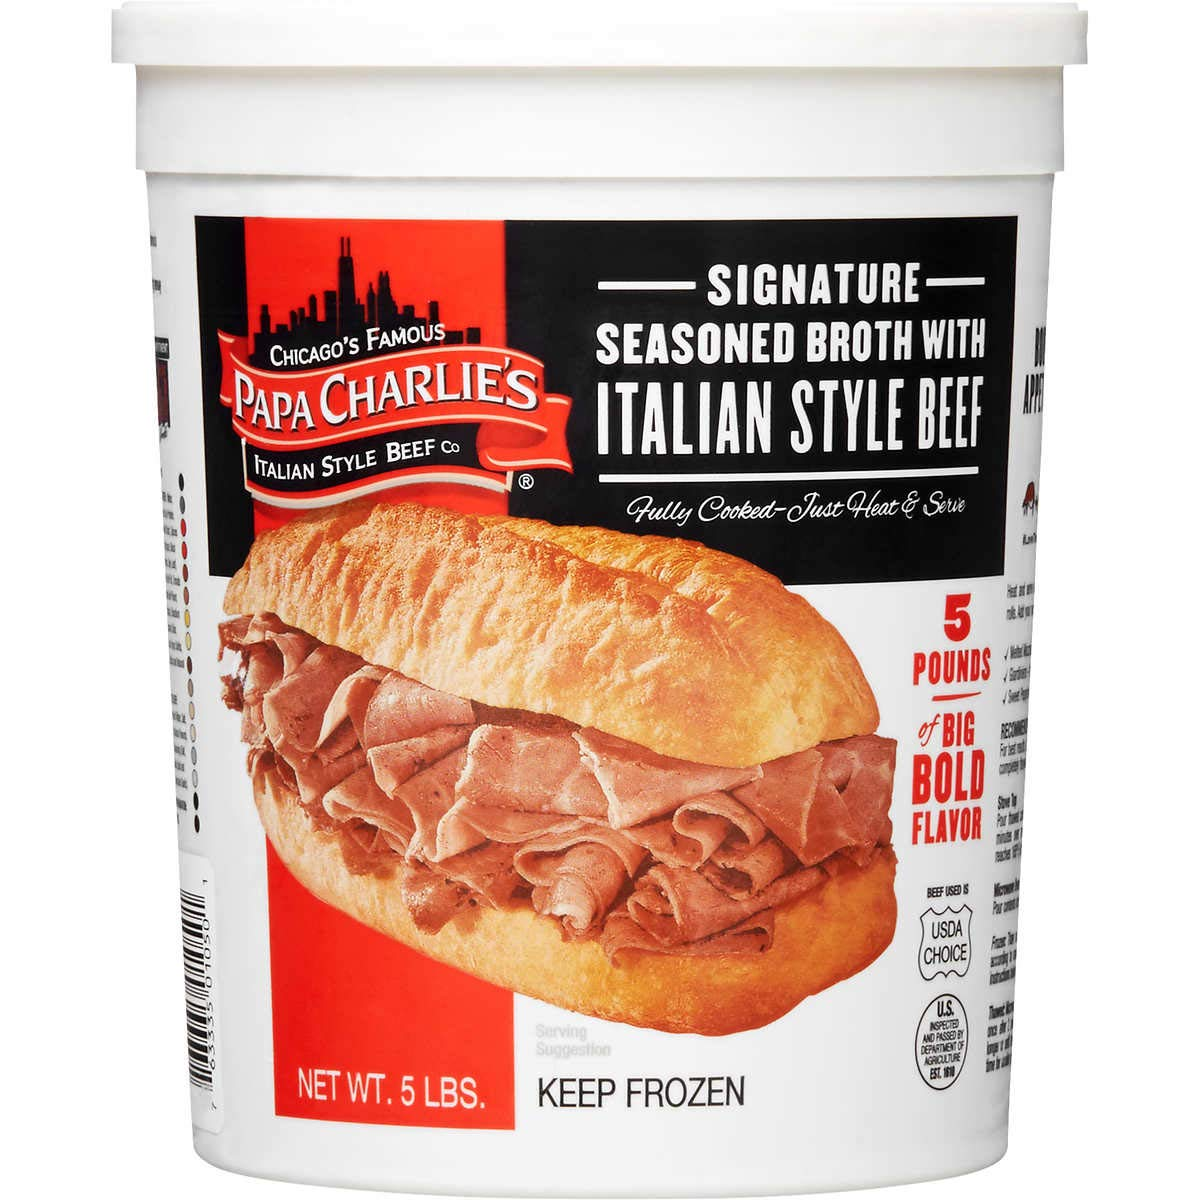 Papa Charlie's Signature Italian Style Beef in Seasoned Broth, 5 lbs